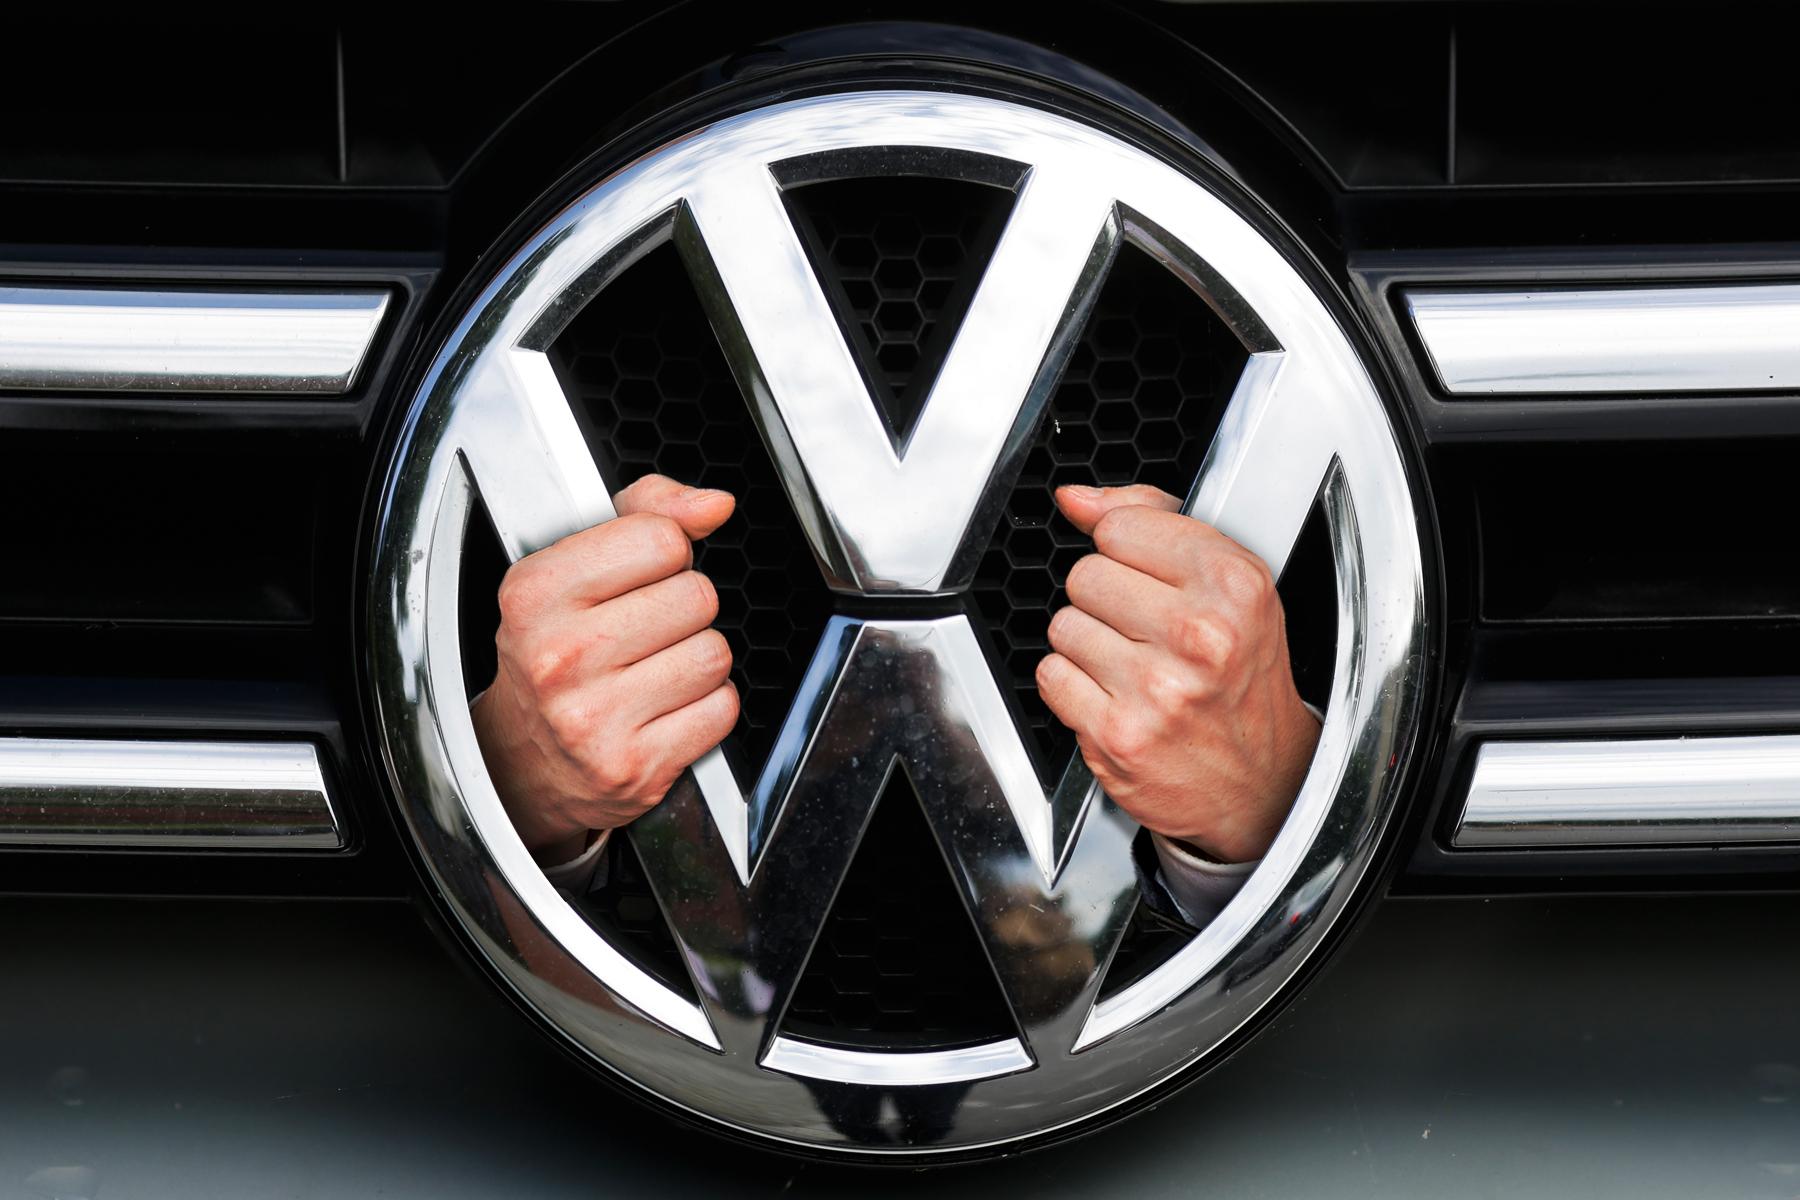 Dieselgate: Donos de carros gastaram quase mil euros na oficina